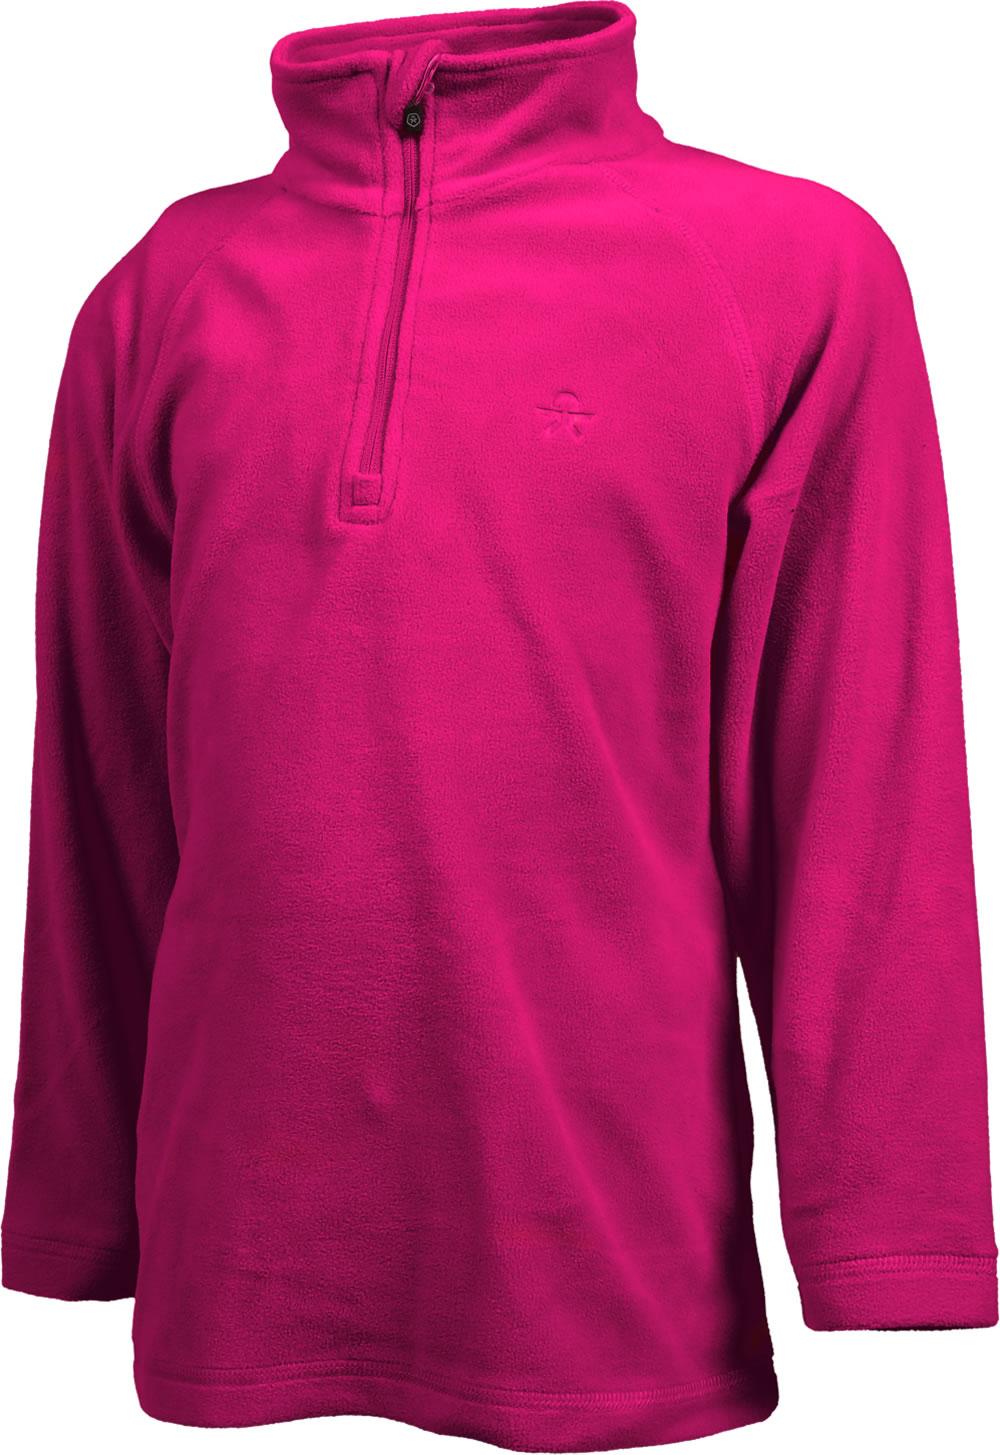 Color Kids Fleece Pullover SANDBERG rasberry 103794 443